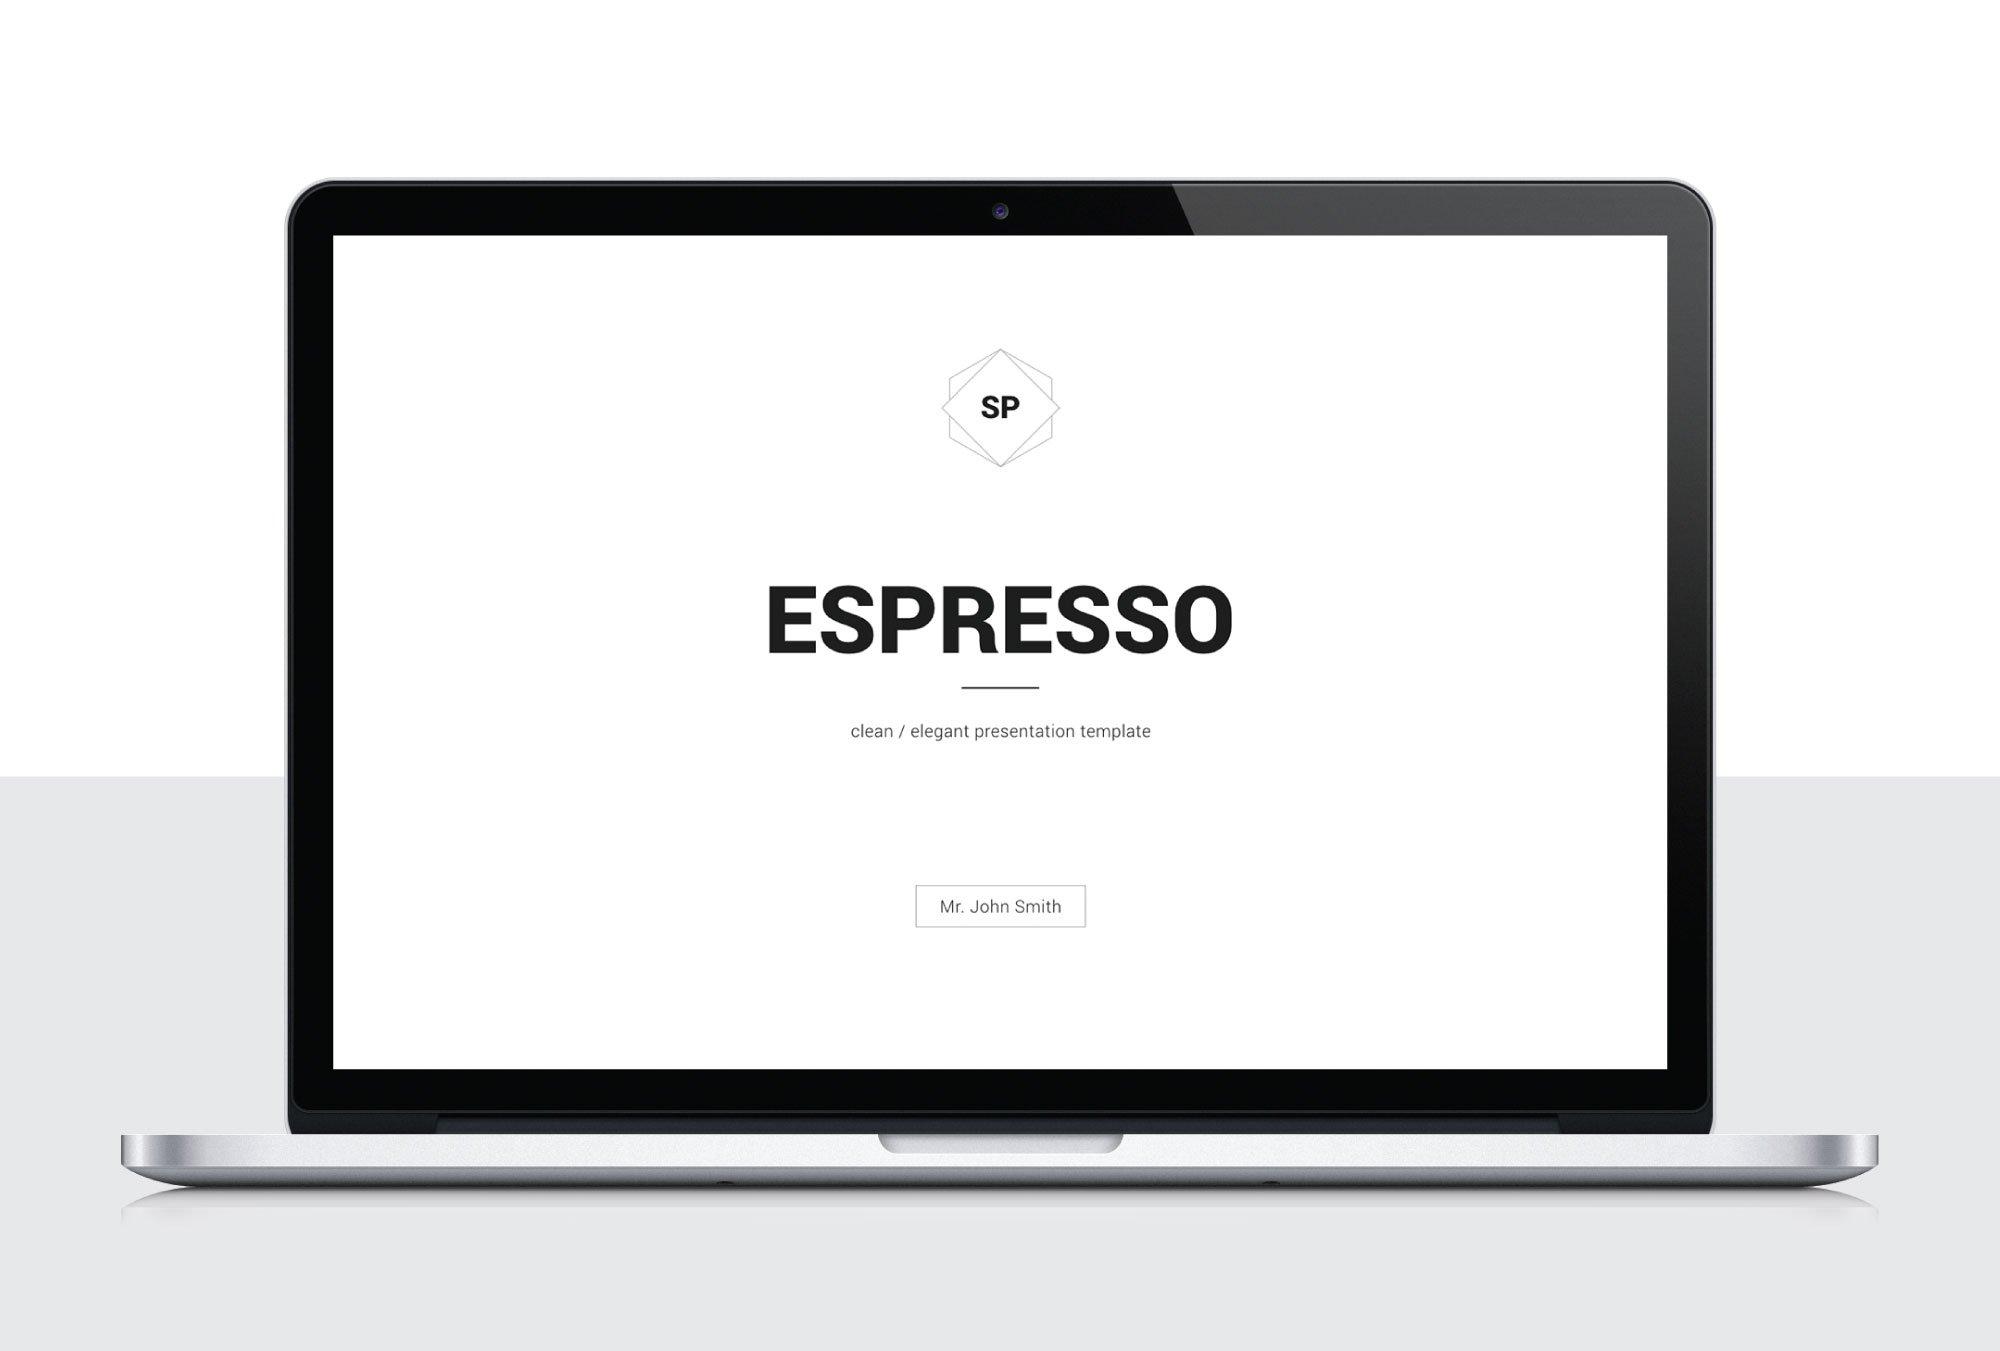 espresso minimal keynote template presentation templates. Black Bedroom Furniture Sets. Home Design Ideas